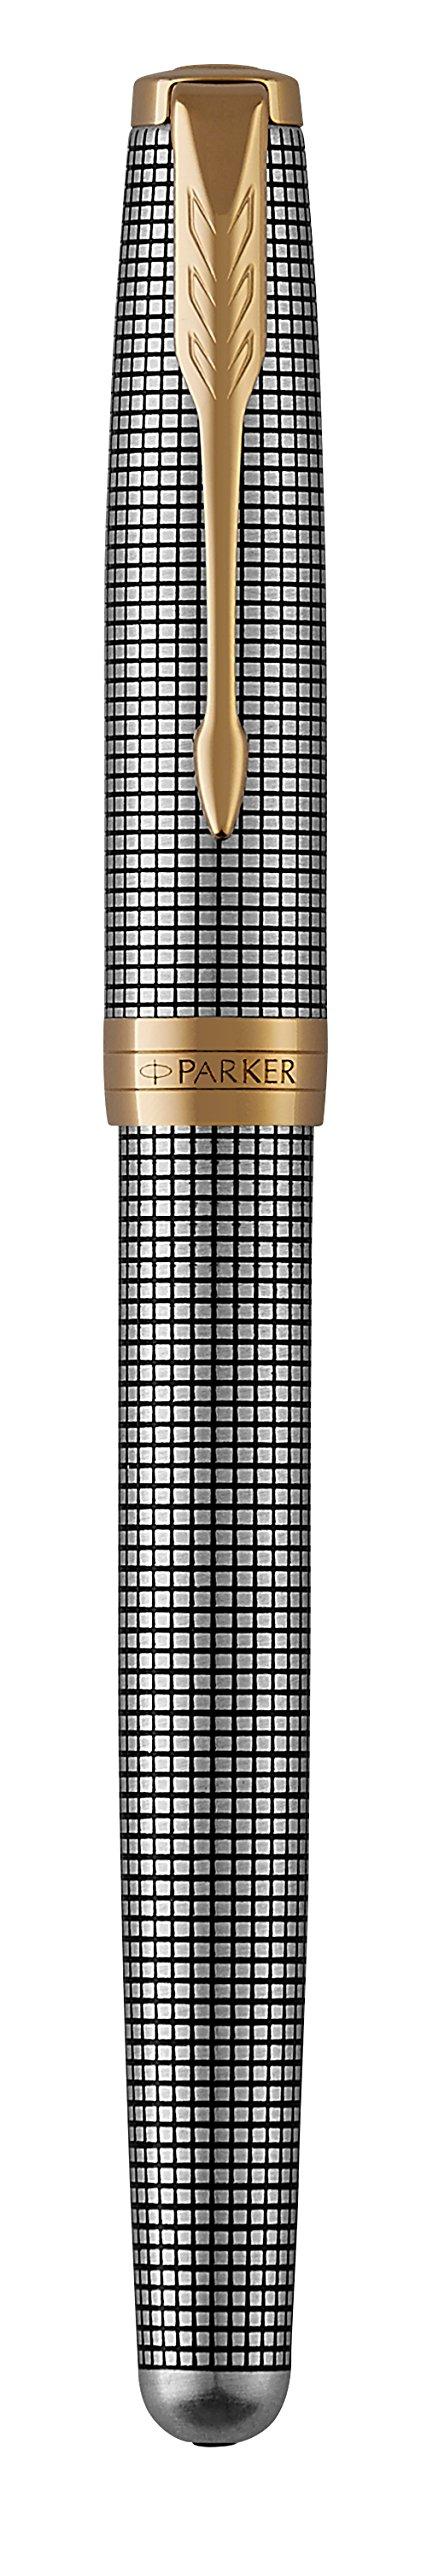 PARKER Sonnet Rollerball Pen, Prestige Chiselled Silver with Gold Trim, Fine Point Black Ink by Parker (Image #6)